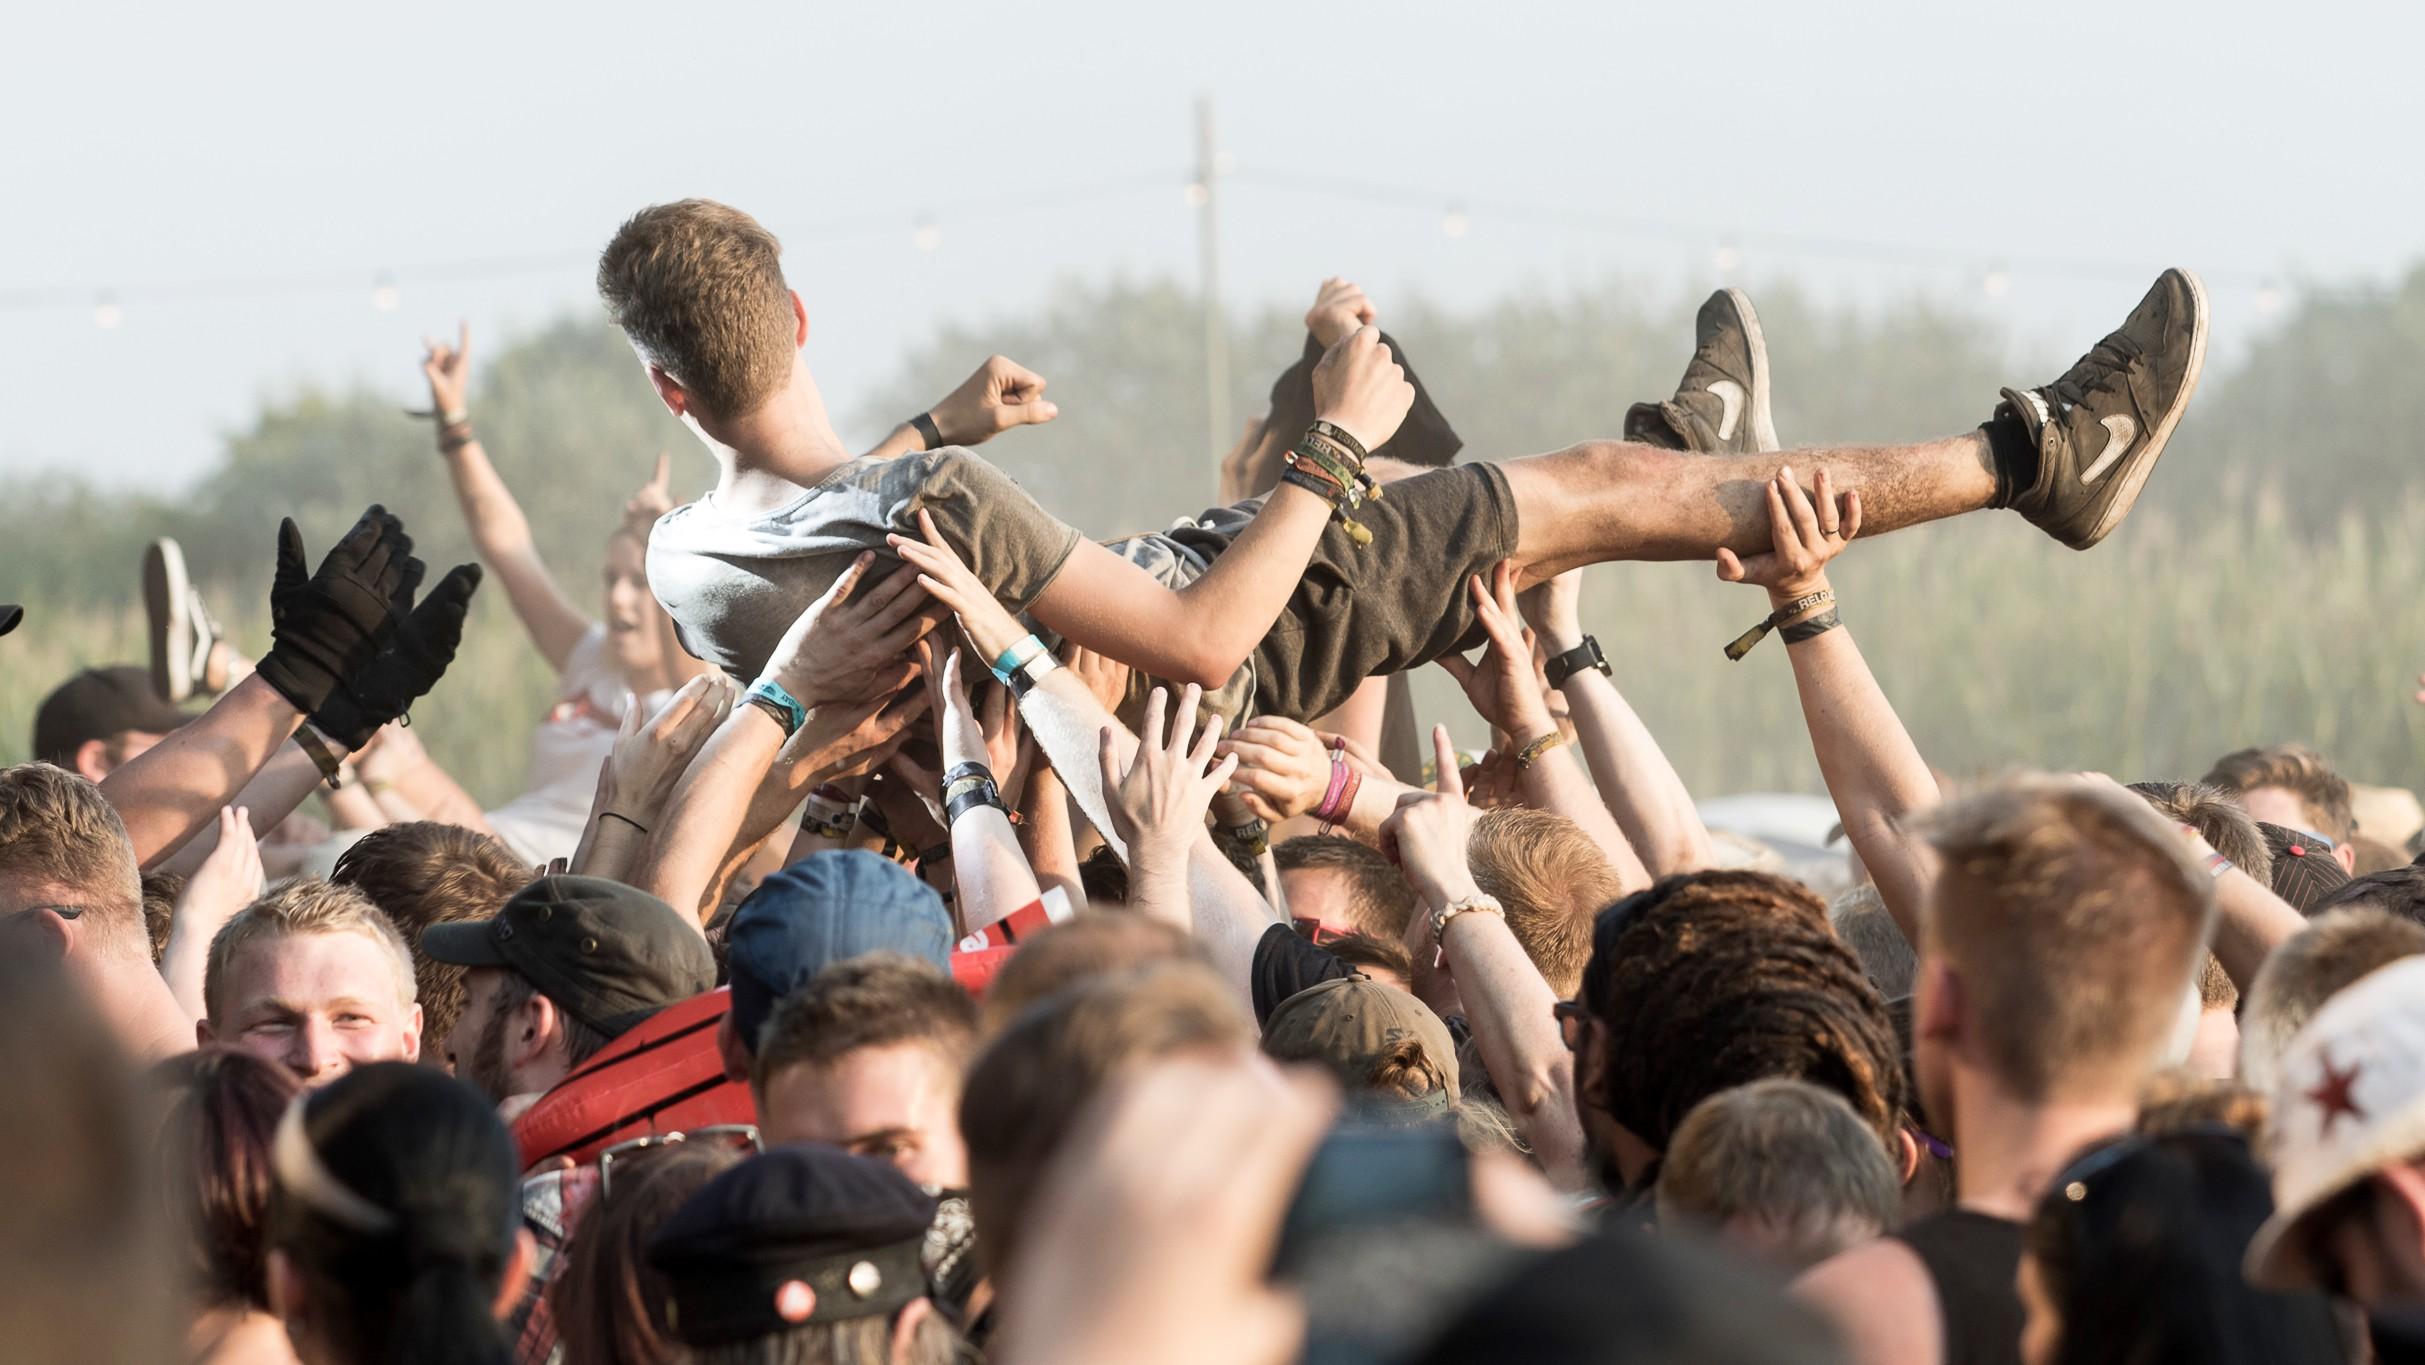 Coachella Death Metal Heavy Metal Spotify Corona Coronavirus Spotify Störung Festival Festival-Sommer